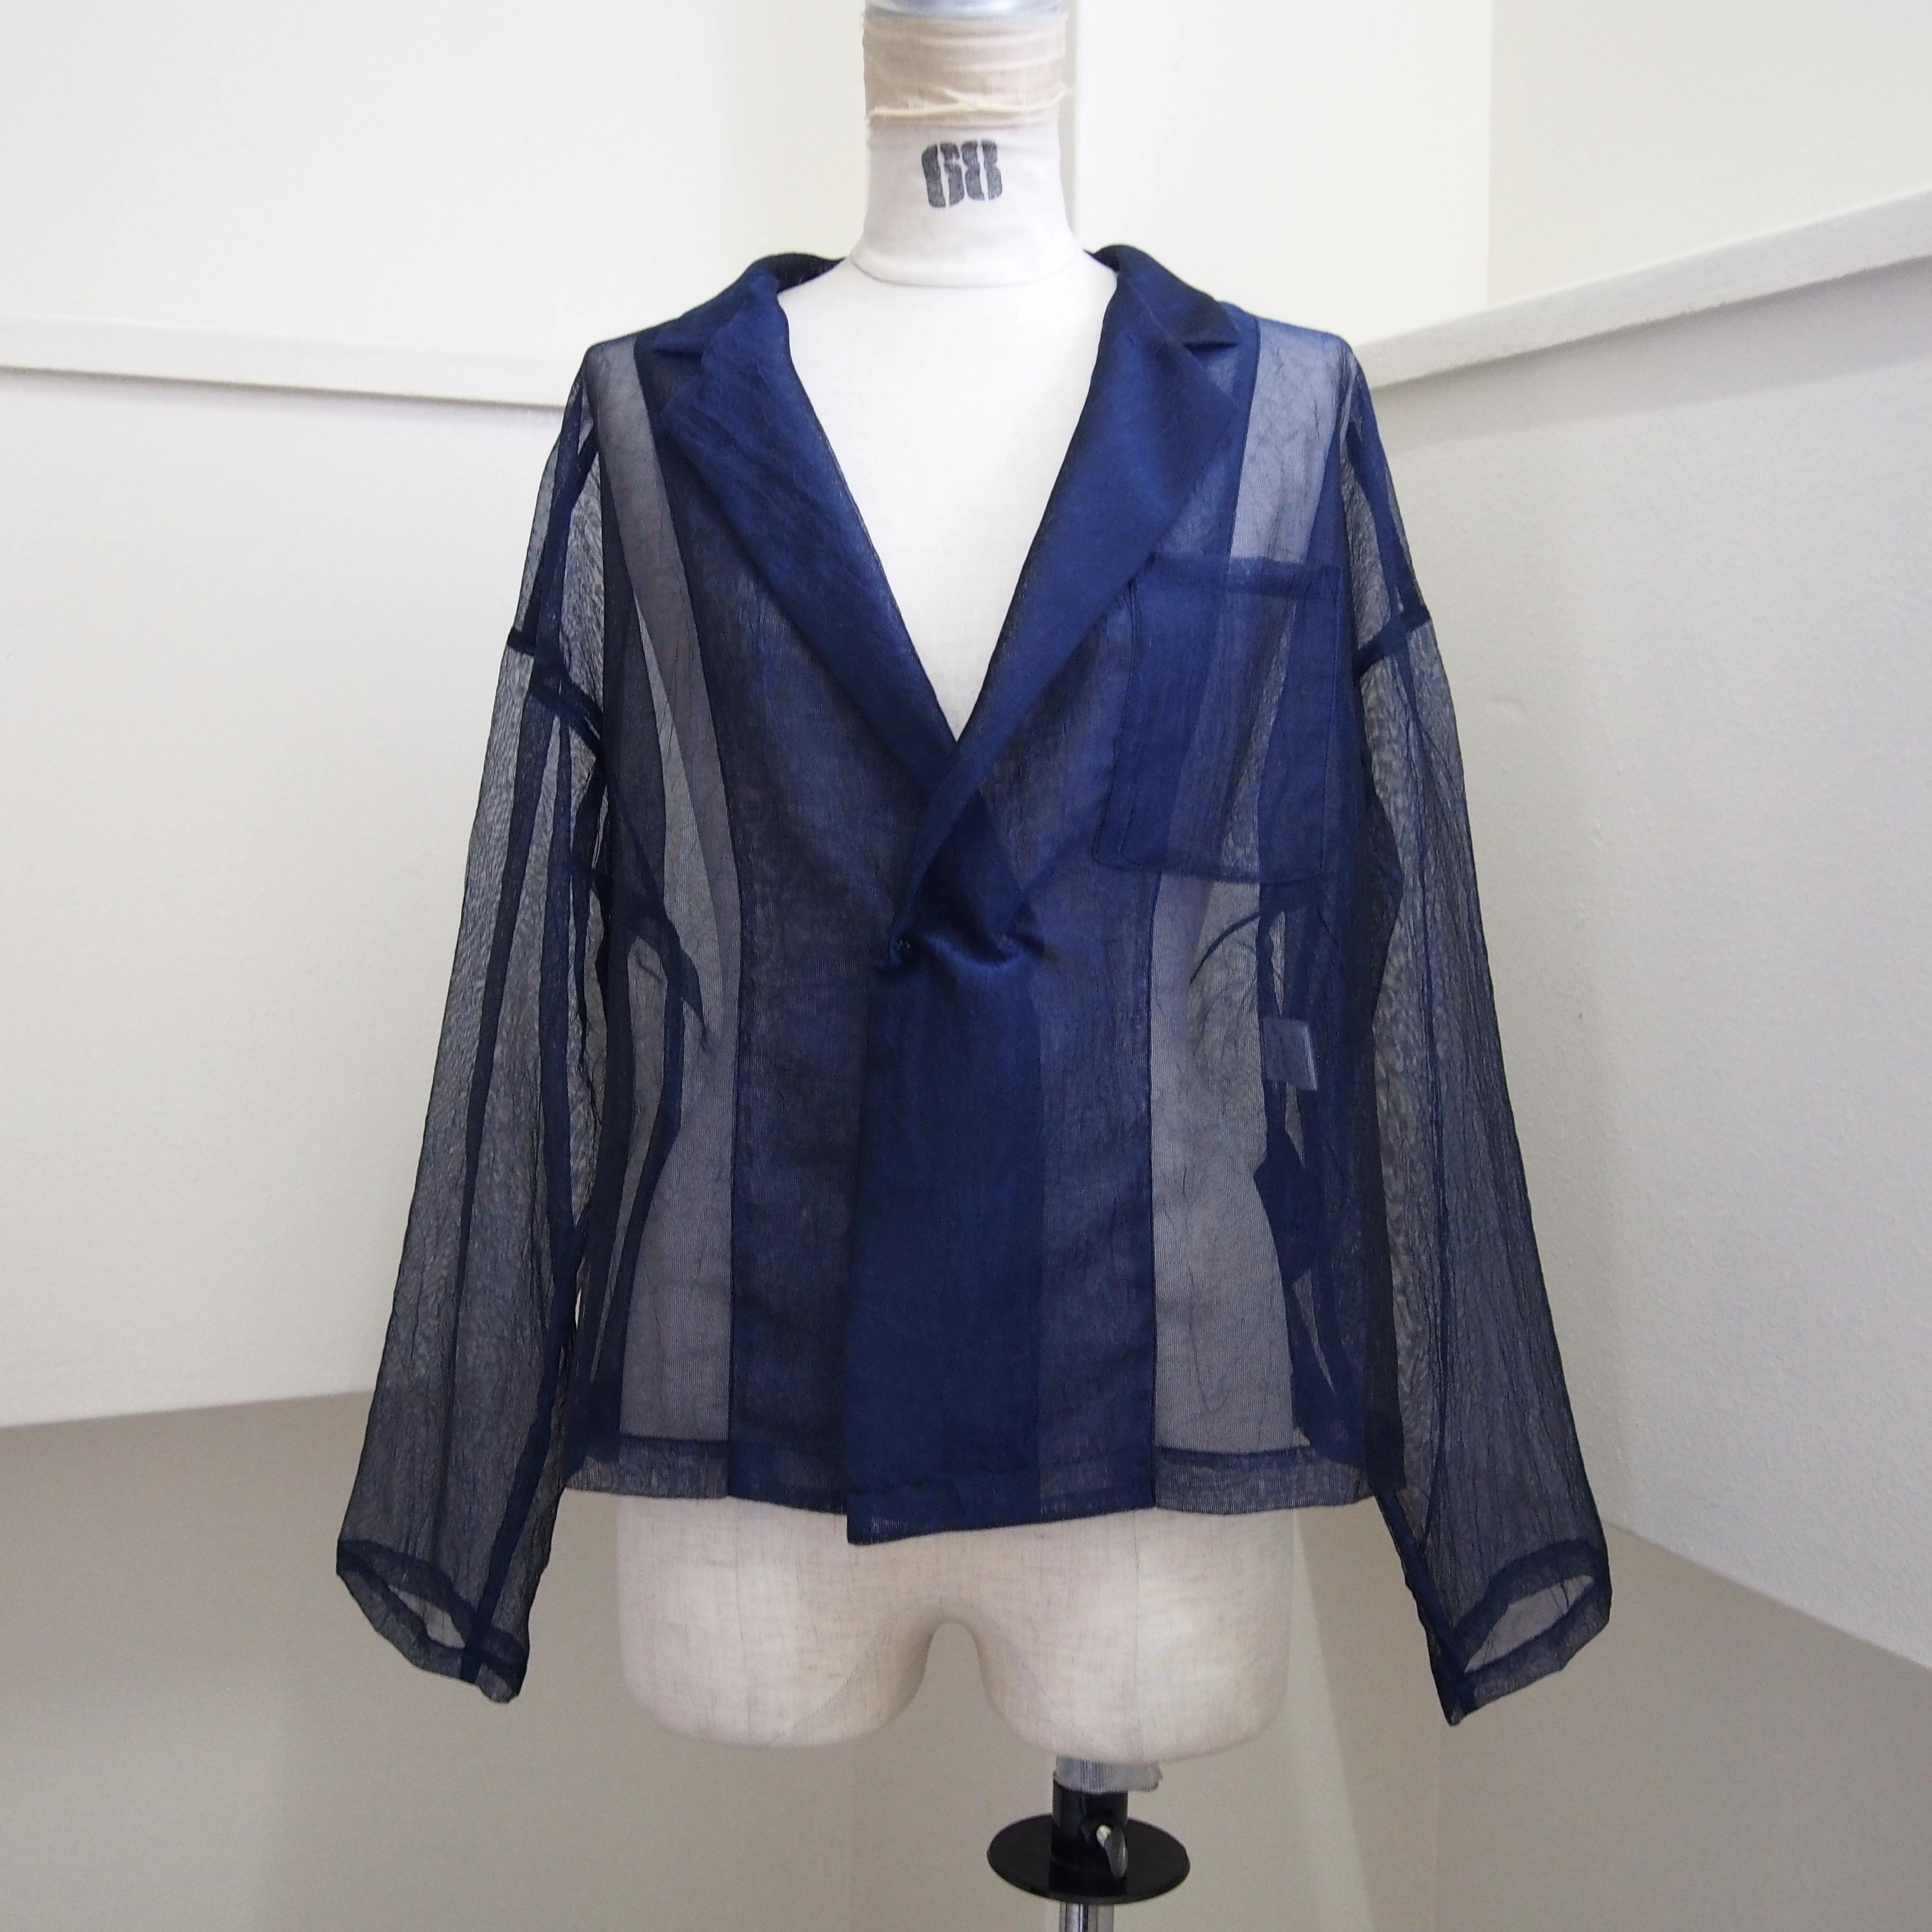 【RehersalL】mesh short coat (navy)/【リハーズオール】メッシュ ショートコート(navy)